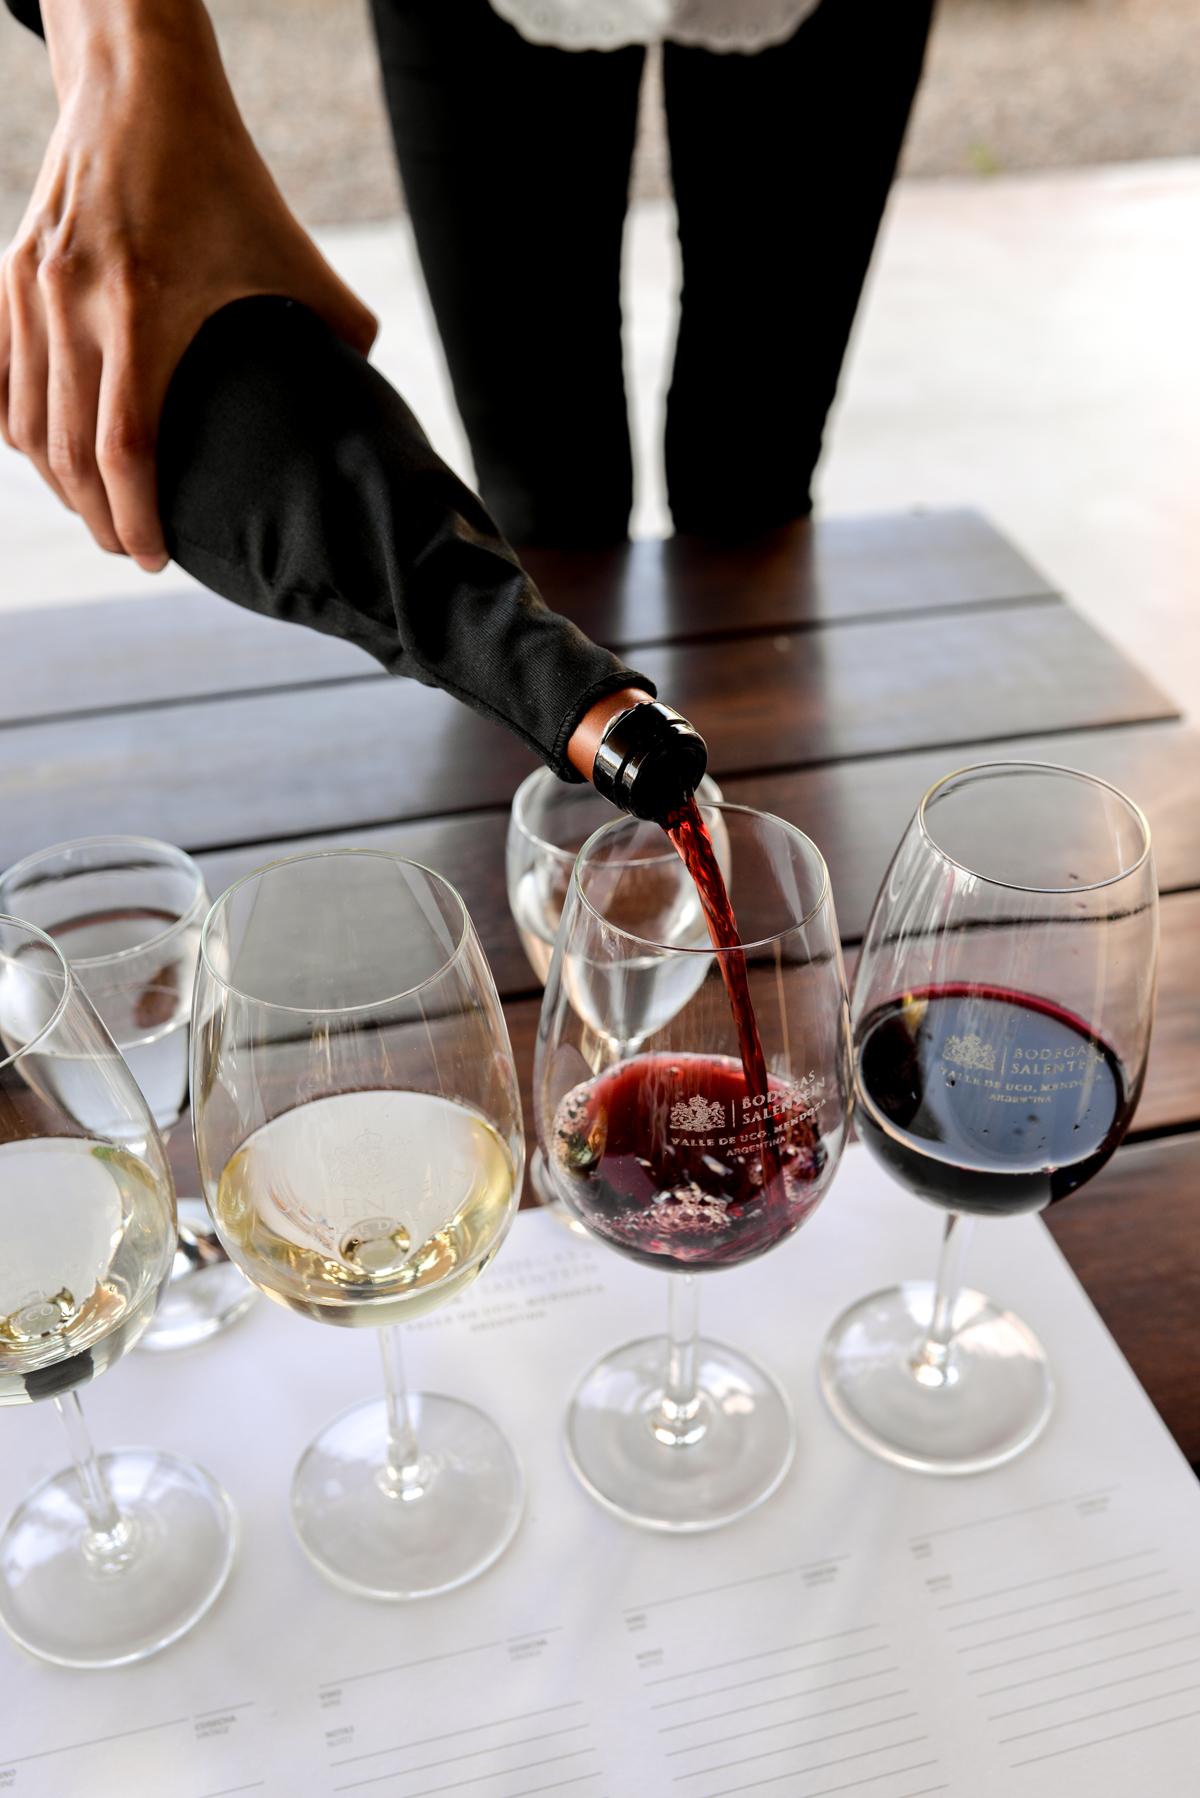 Stacie-Flinner-Best-Mendoza-Winery-29